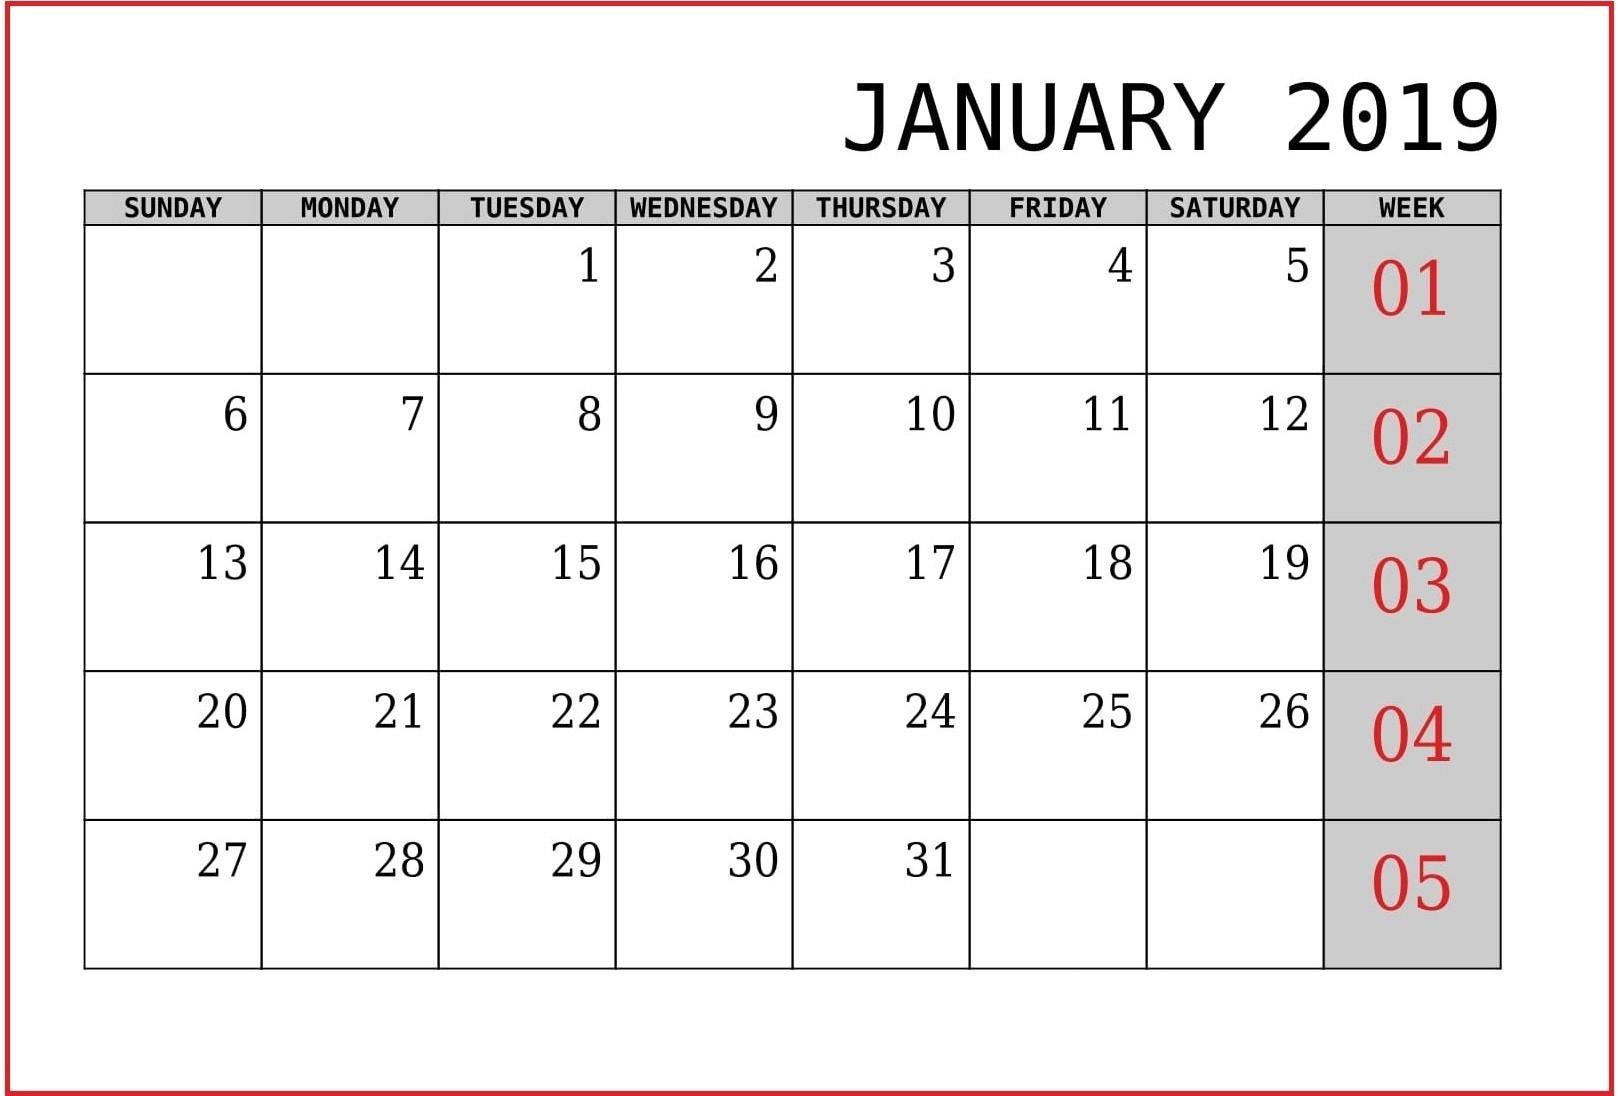 January 2019 Calendar Us Printable Templates With Holidays-Us Printable Blank Calendars